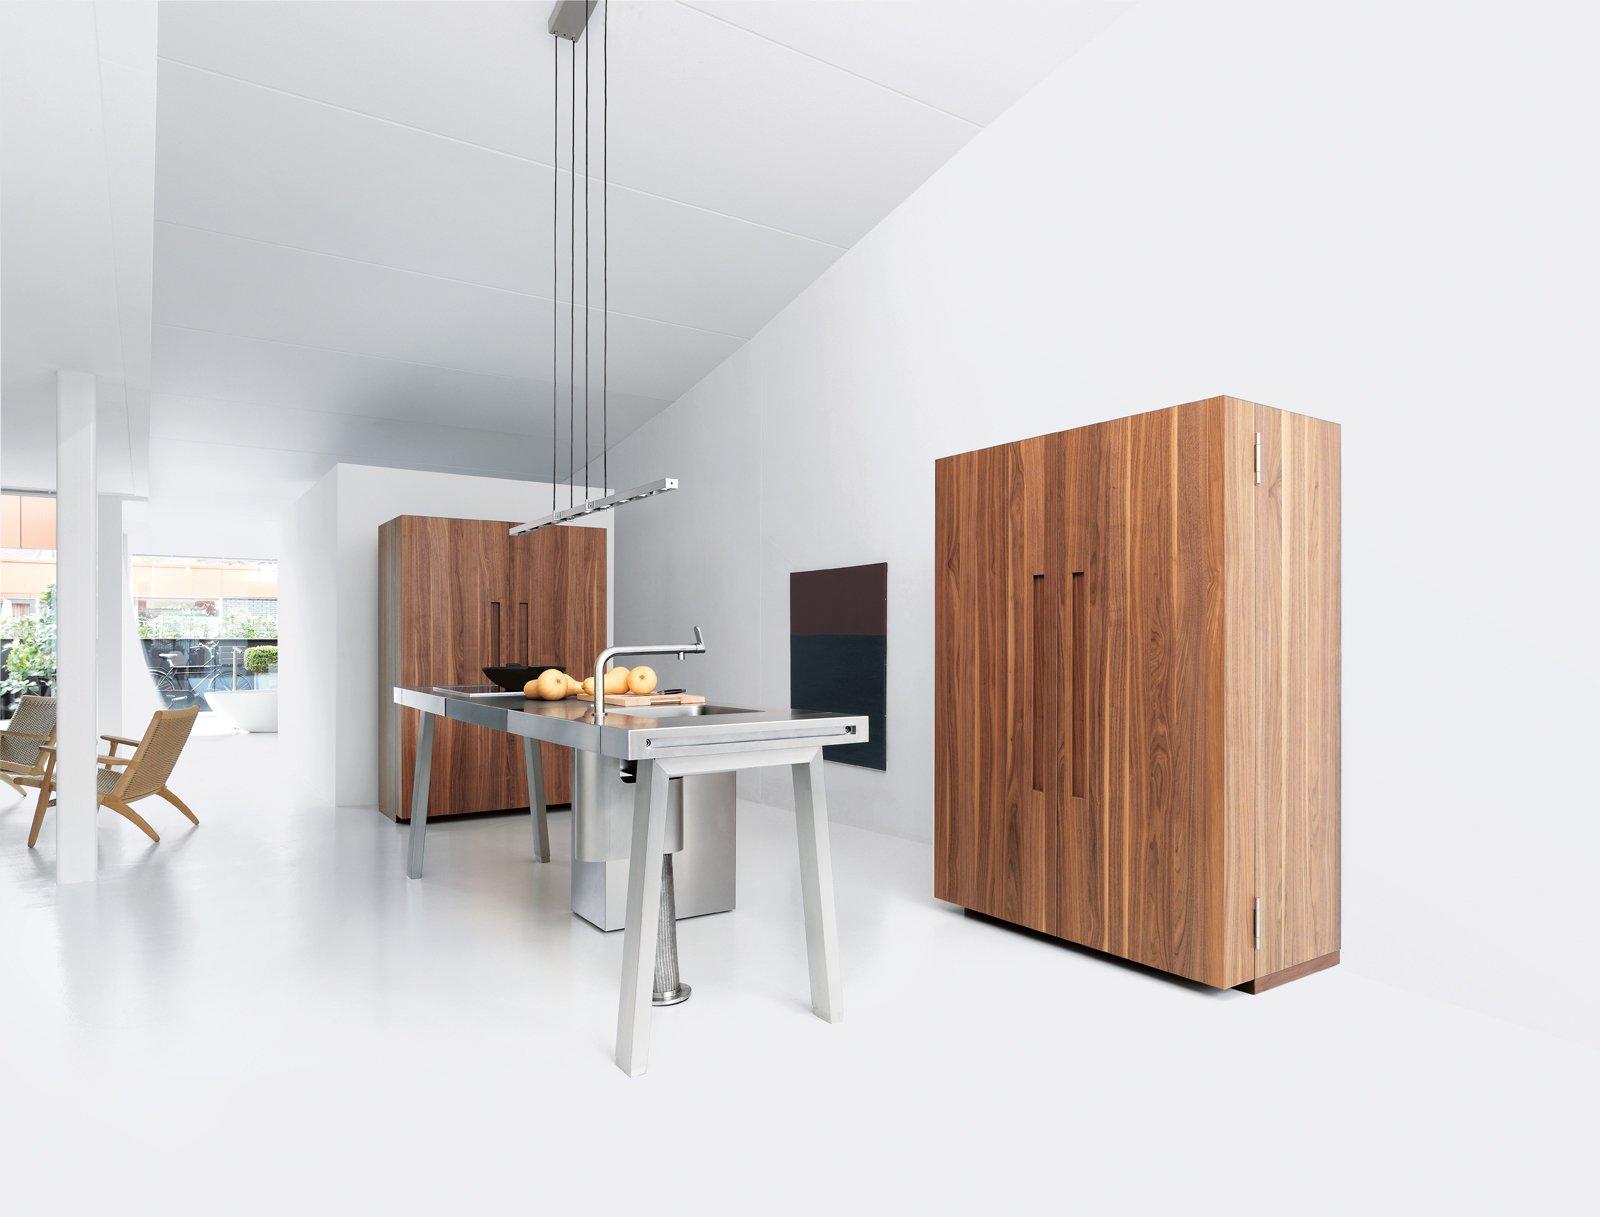 Bulthaup s B2 Kitchen System Dwell